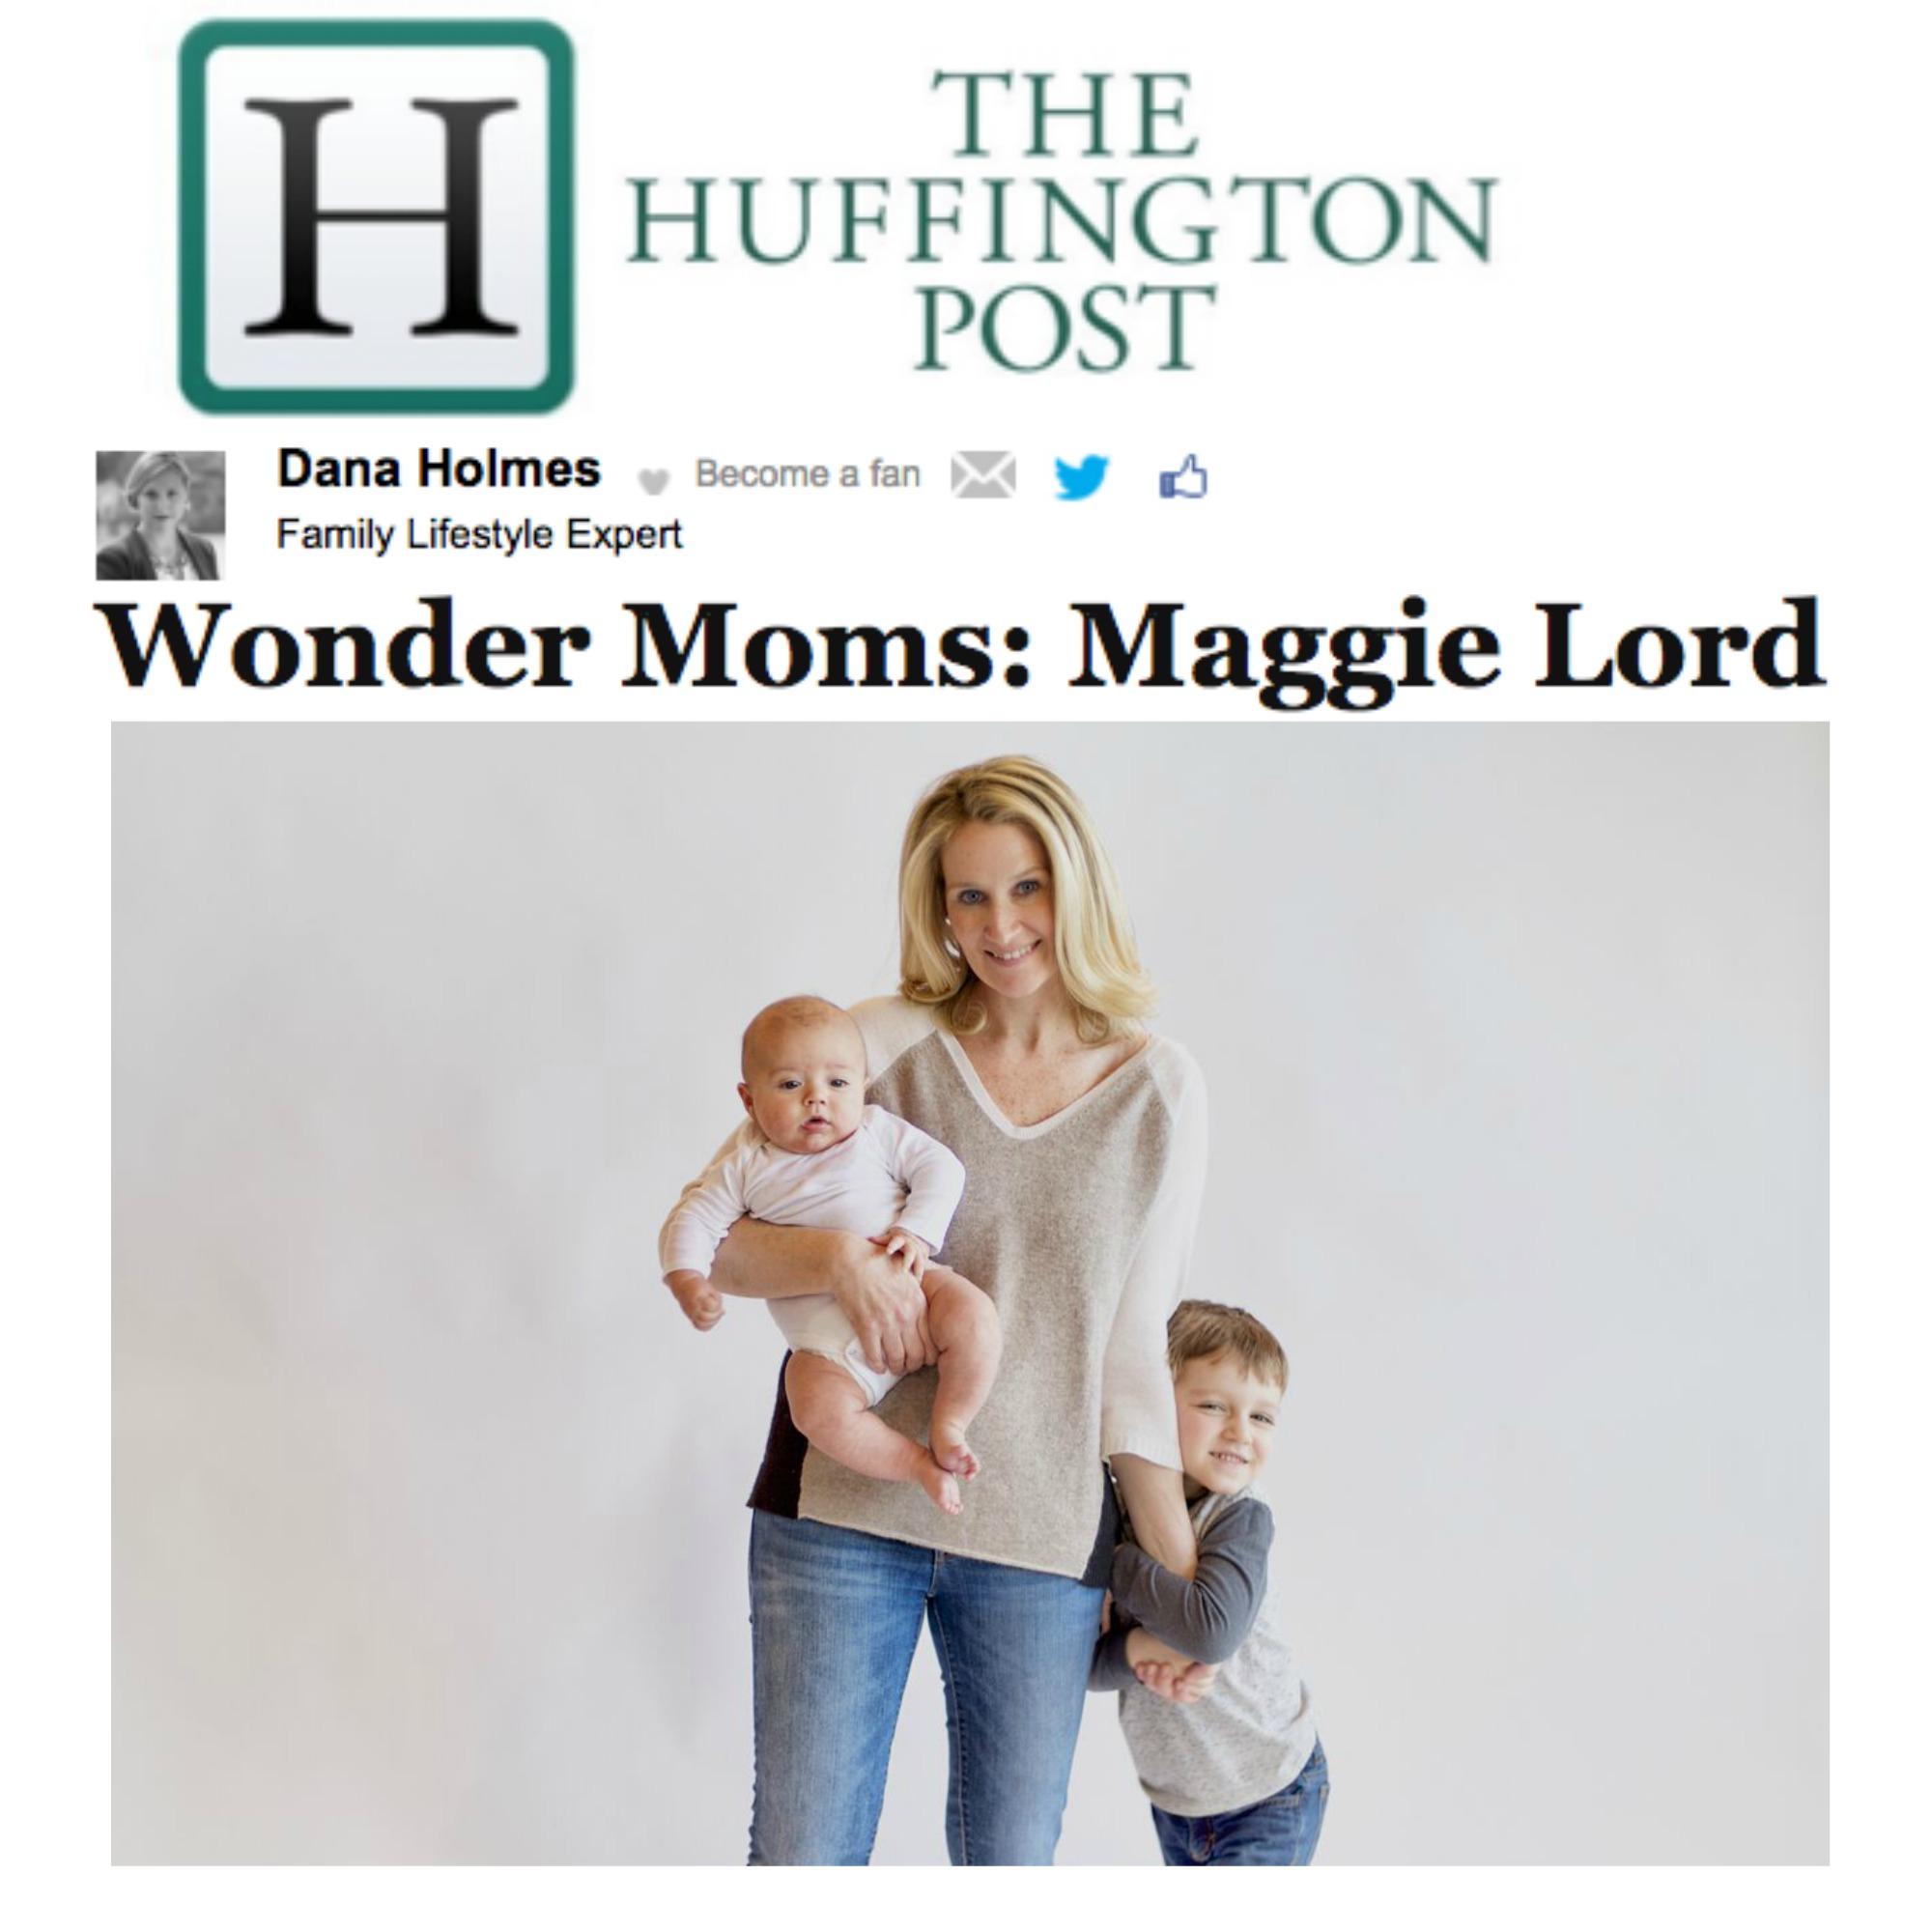 The Huffington Post -  Wonder Mom